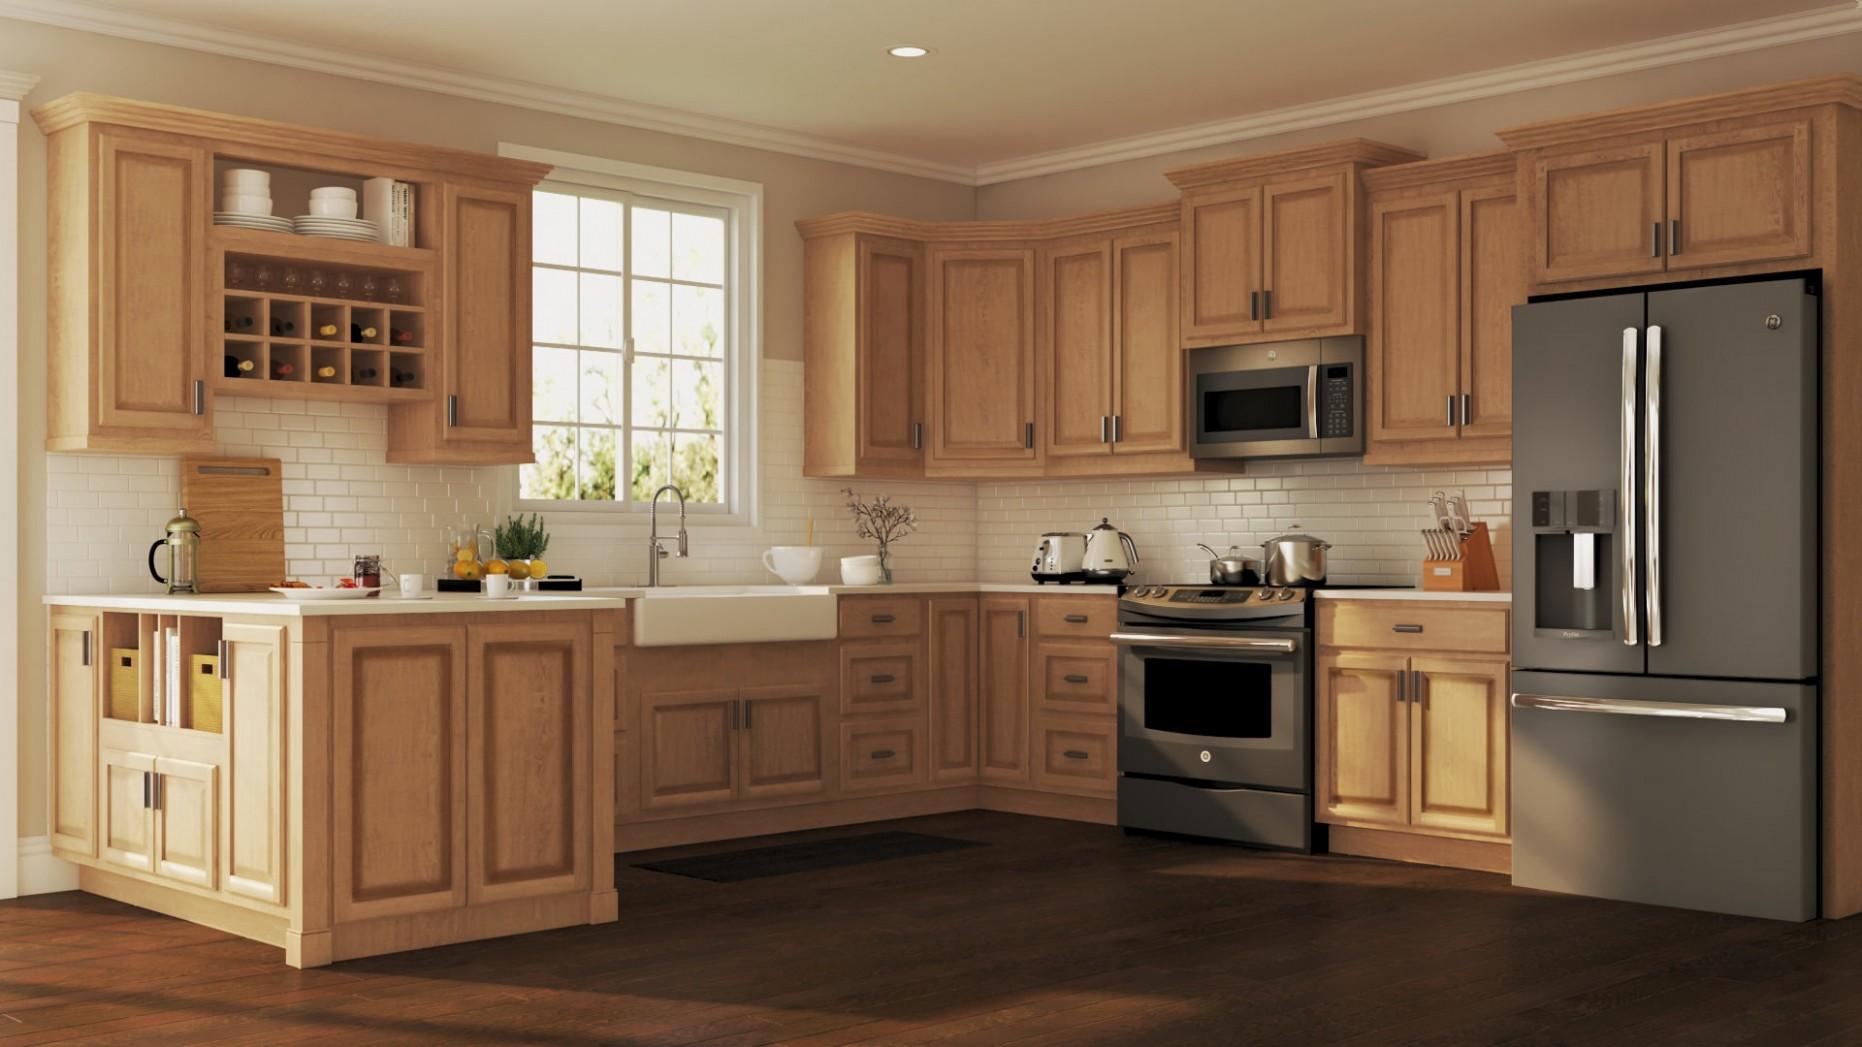 Hampton Wall Kitchen Cabinets in Medium Oak – Kitchen – The Home Depot - Buy Kitchen Wall Cabinets Online